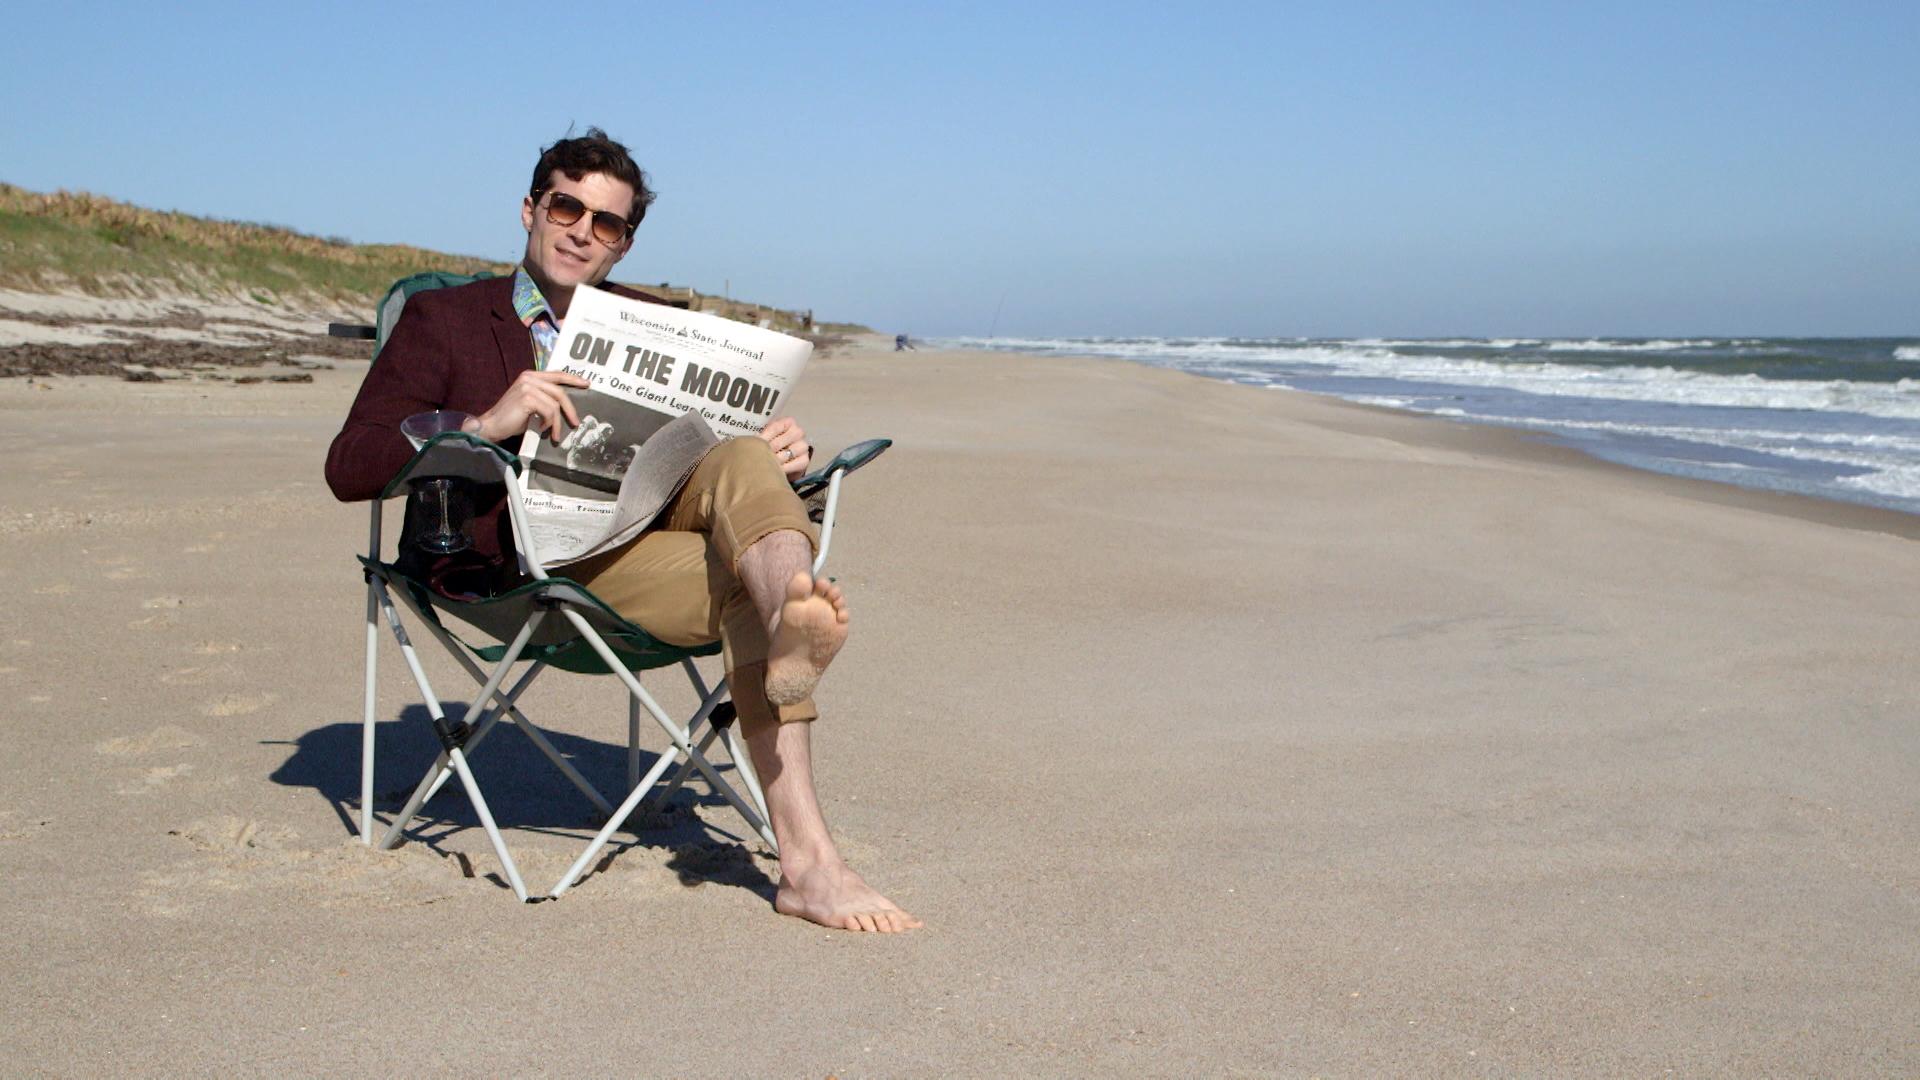 ALAN DUFFY ON PLAYALINDA BEACH.jpg